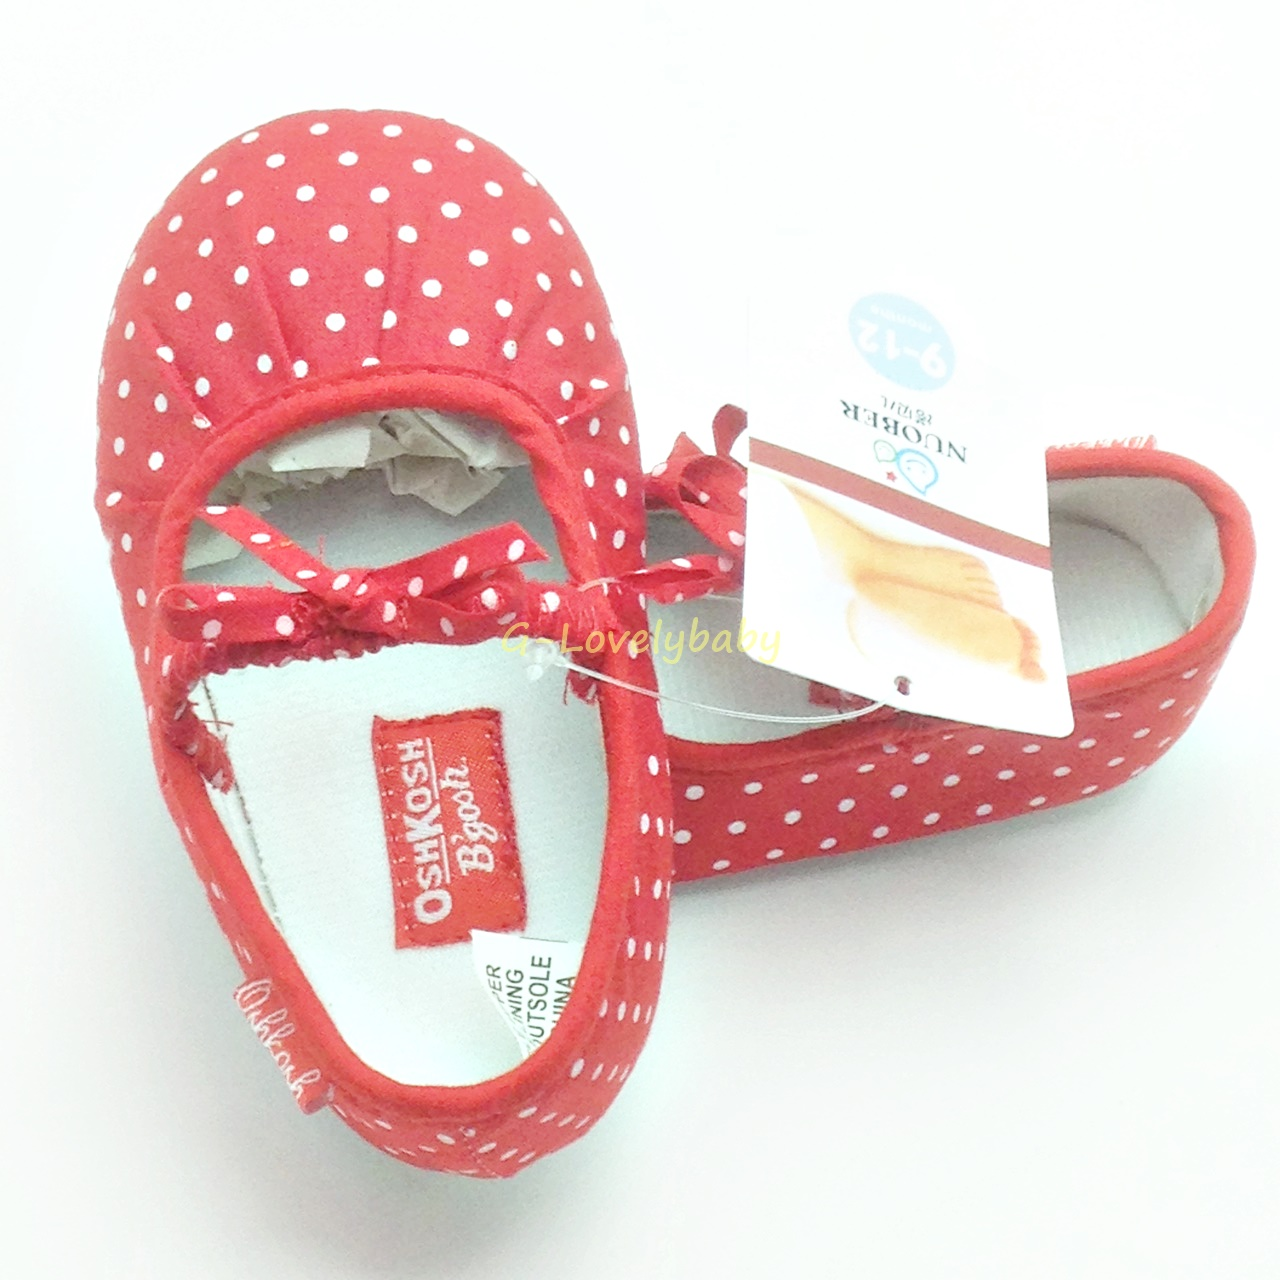 OshKosh B'gosh Pre-walker Baby Shoes รองเท้าเด็ก รองเท้าเด็กแบรนด์เนม รองเท้าเด็กหญิง รองเท้าเด็กวัยหัดเดิน ยี่ห้อ OshKosh B'gosh